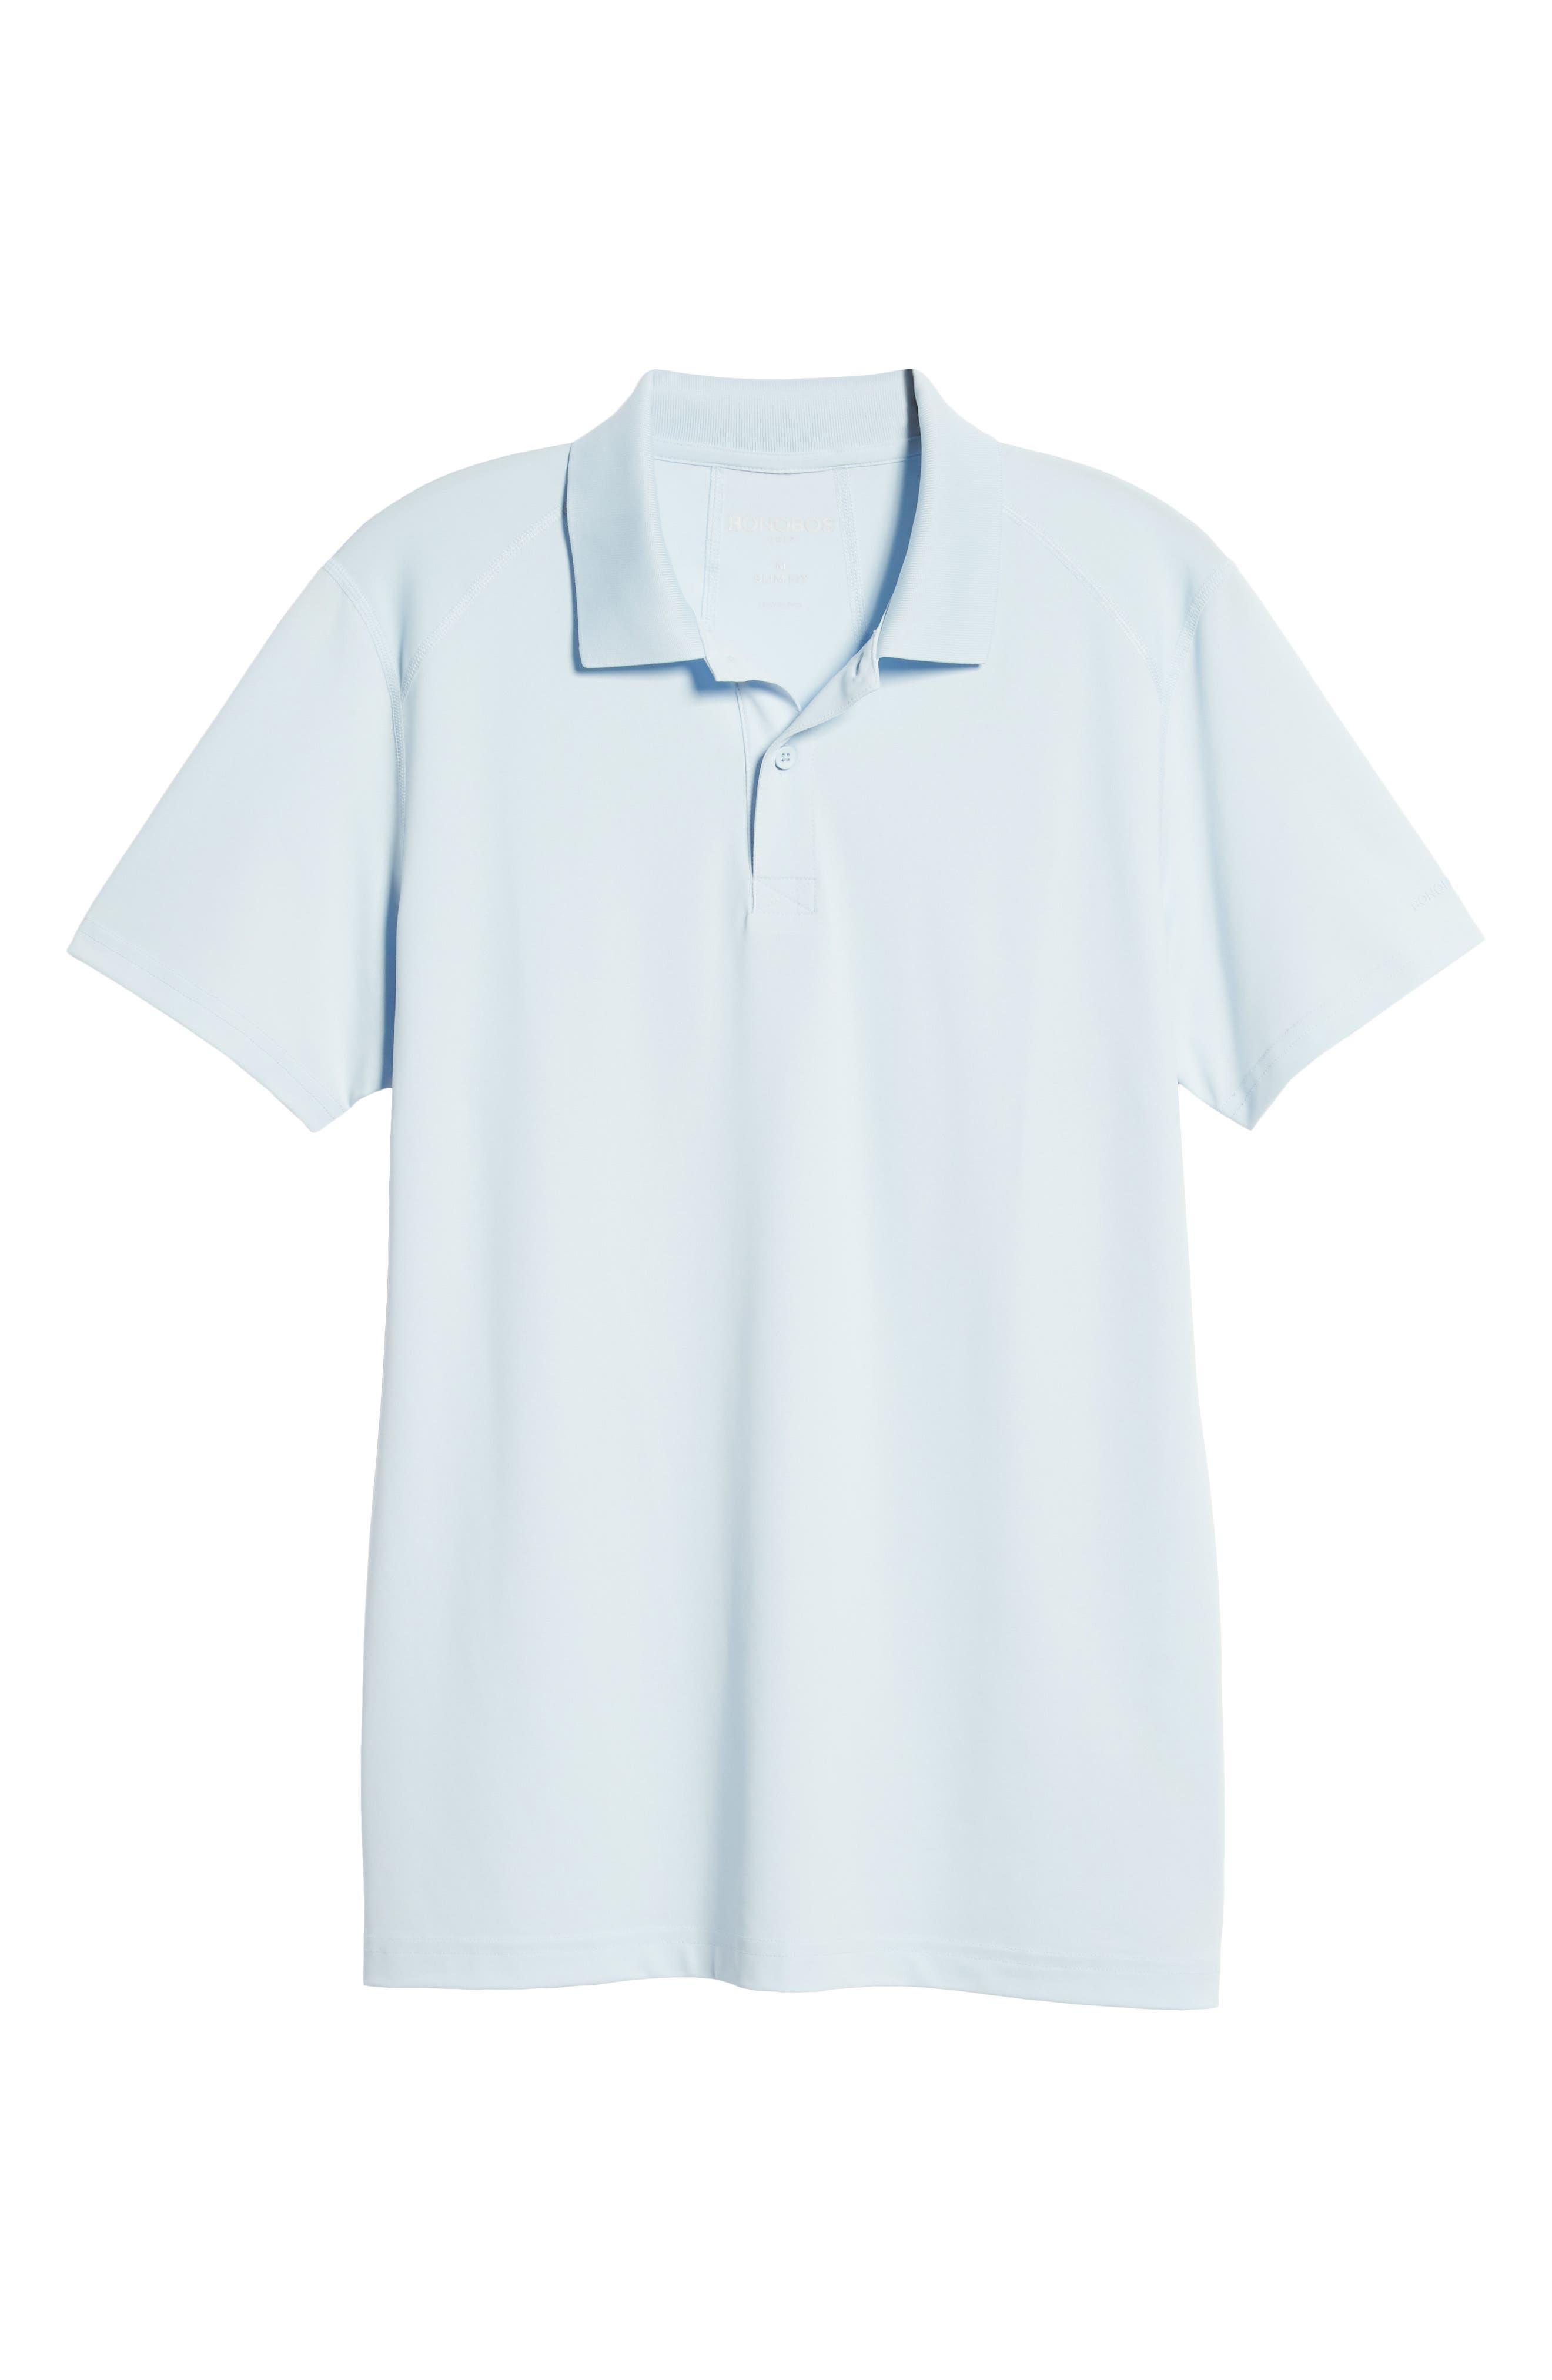 M-Flex Flatiron Slim Fit Golf Polo,                             Alternate thumbnail 6, color,                             SKY BLUE